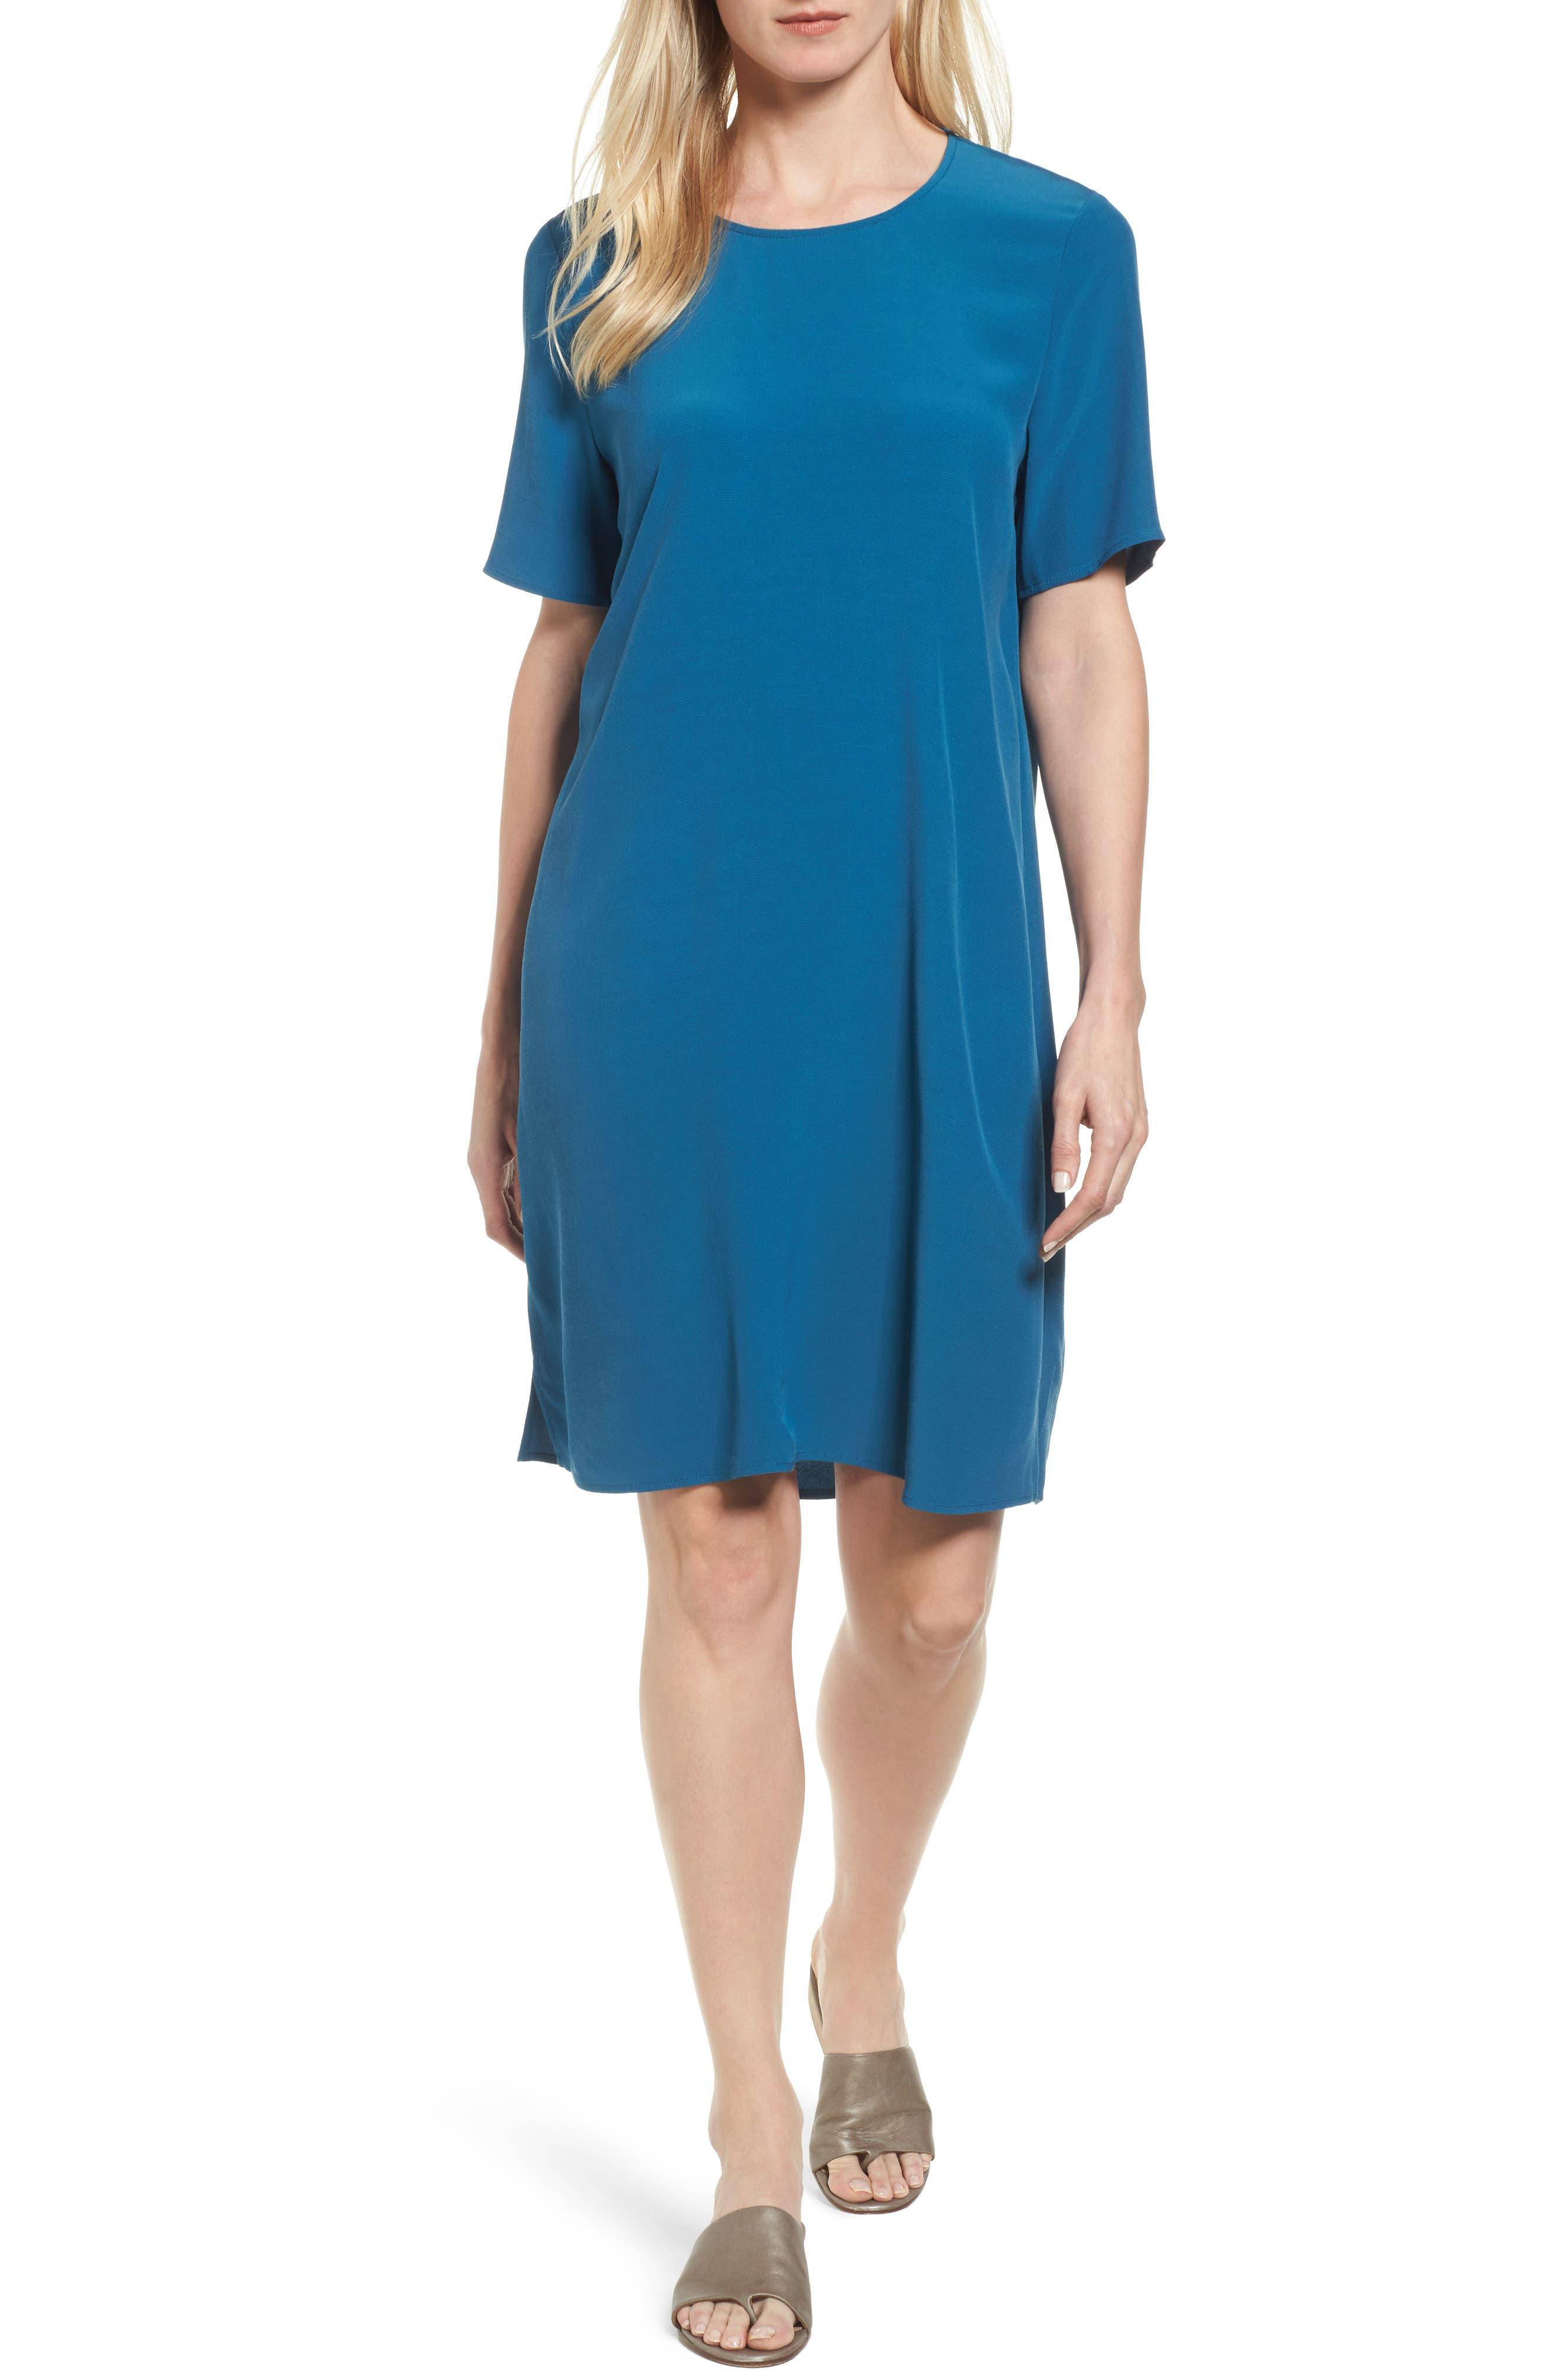 Alternate Image 1 Selected - Eileen Fisher Tencel® Blend Jersey Shift Dress (Regular & Petite)